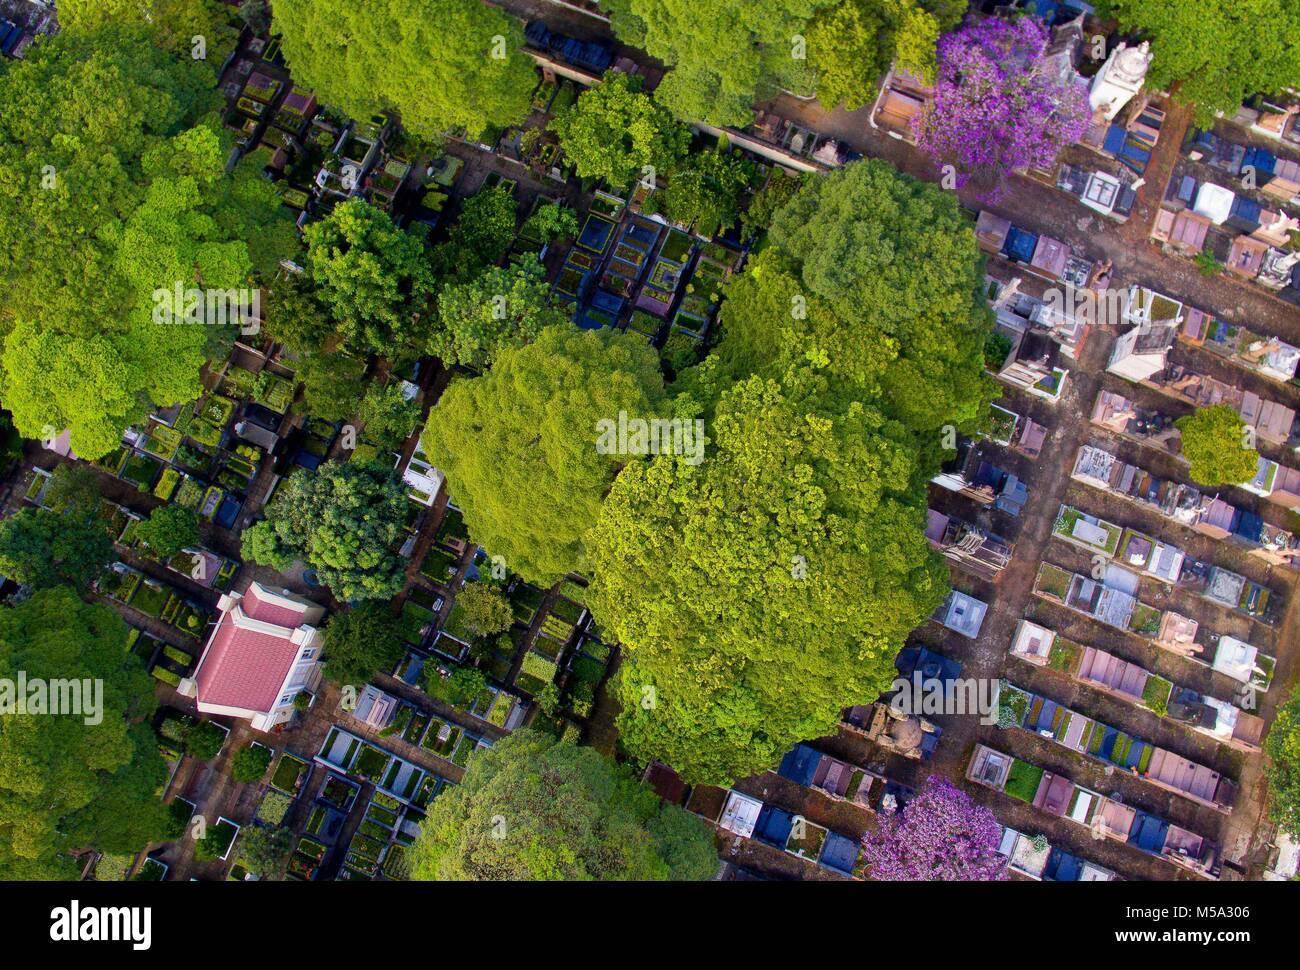 Aerial Target Stockfotos & Aerial Target Bilder - Seite 3 - Alamy